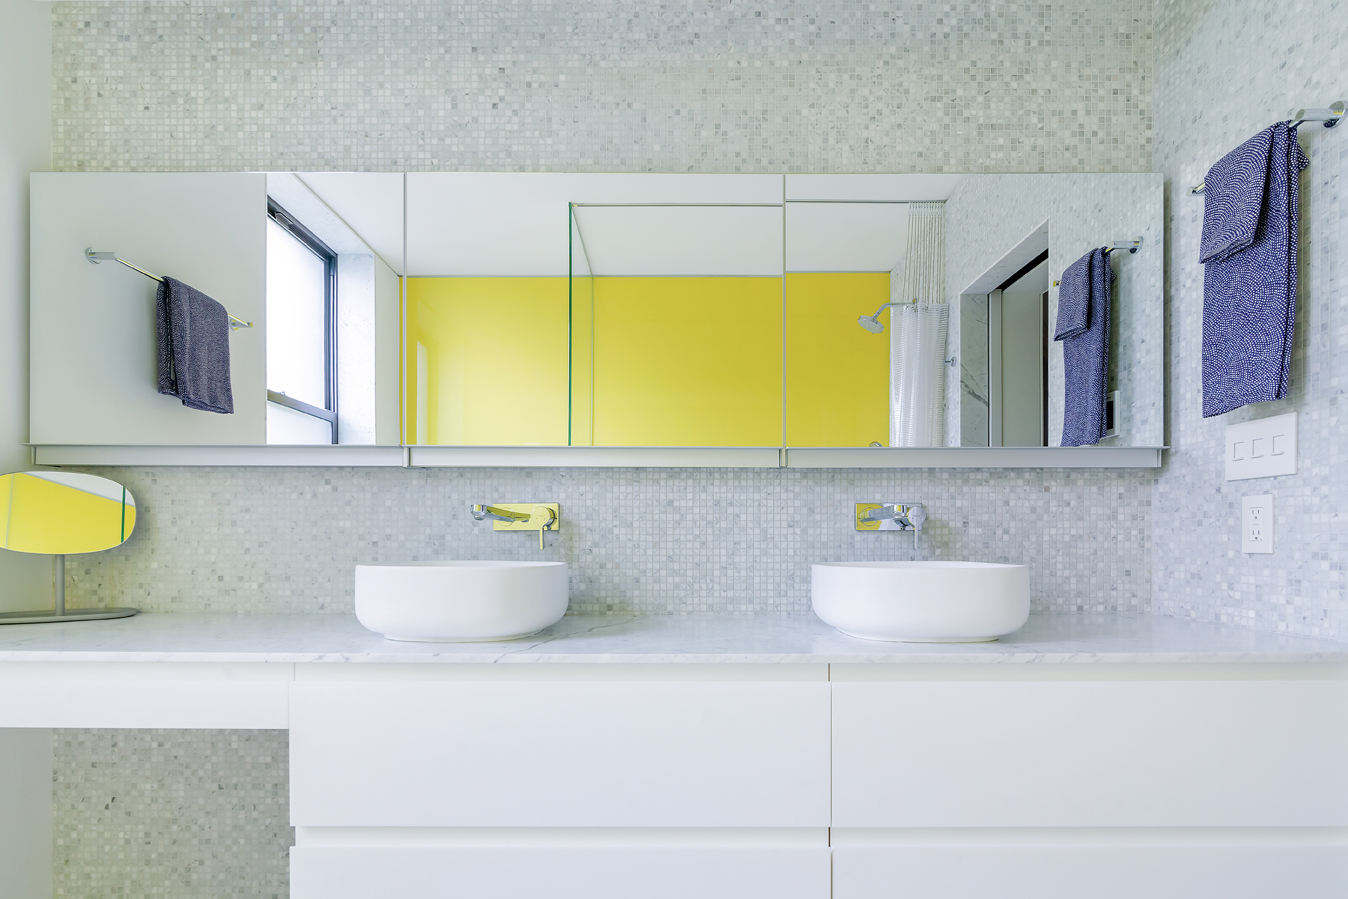 bathroom-interior-architecture-new-york-01.JPG